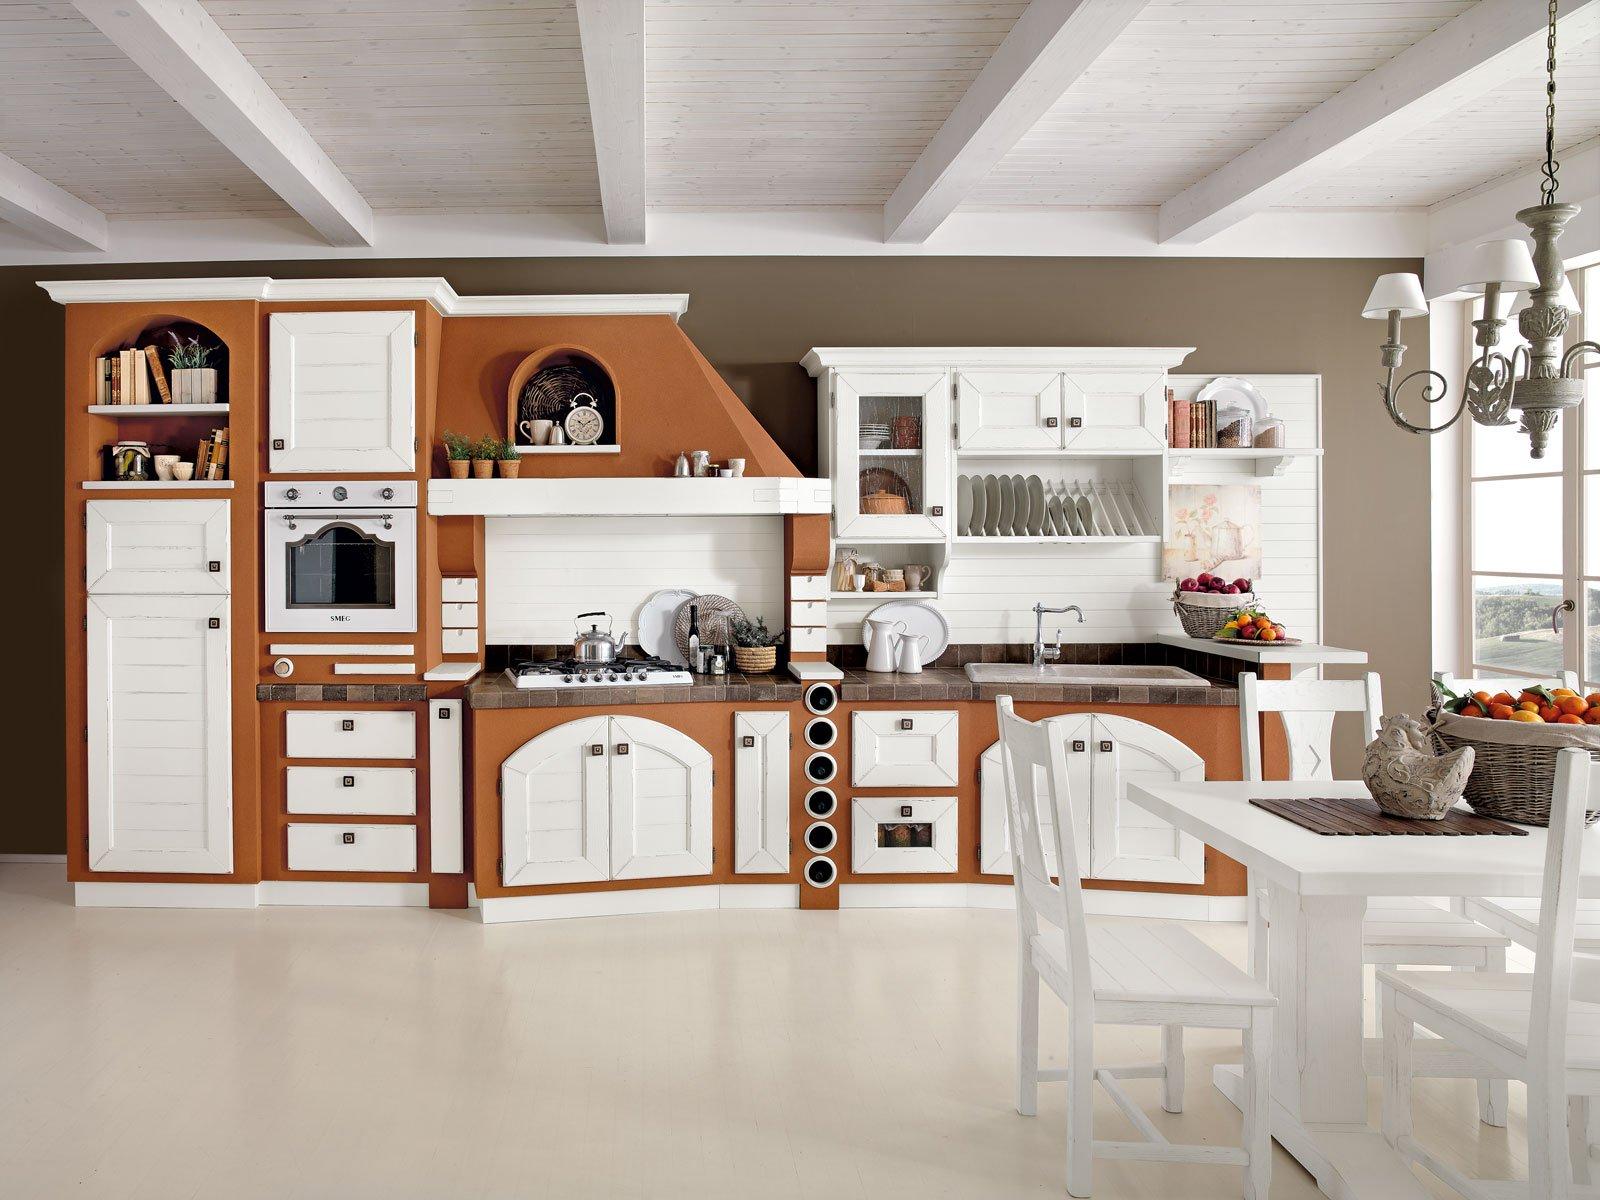 Cucine effetto muratura vera o finta cose di casa for Cucine in murature